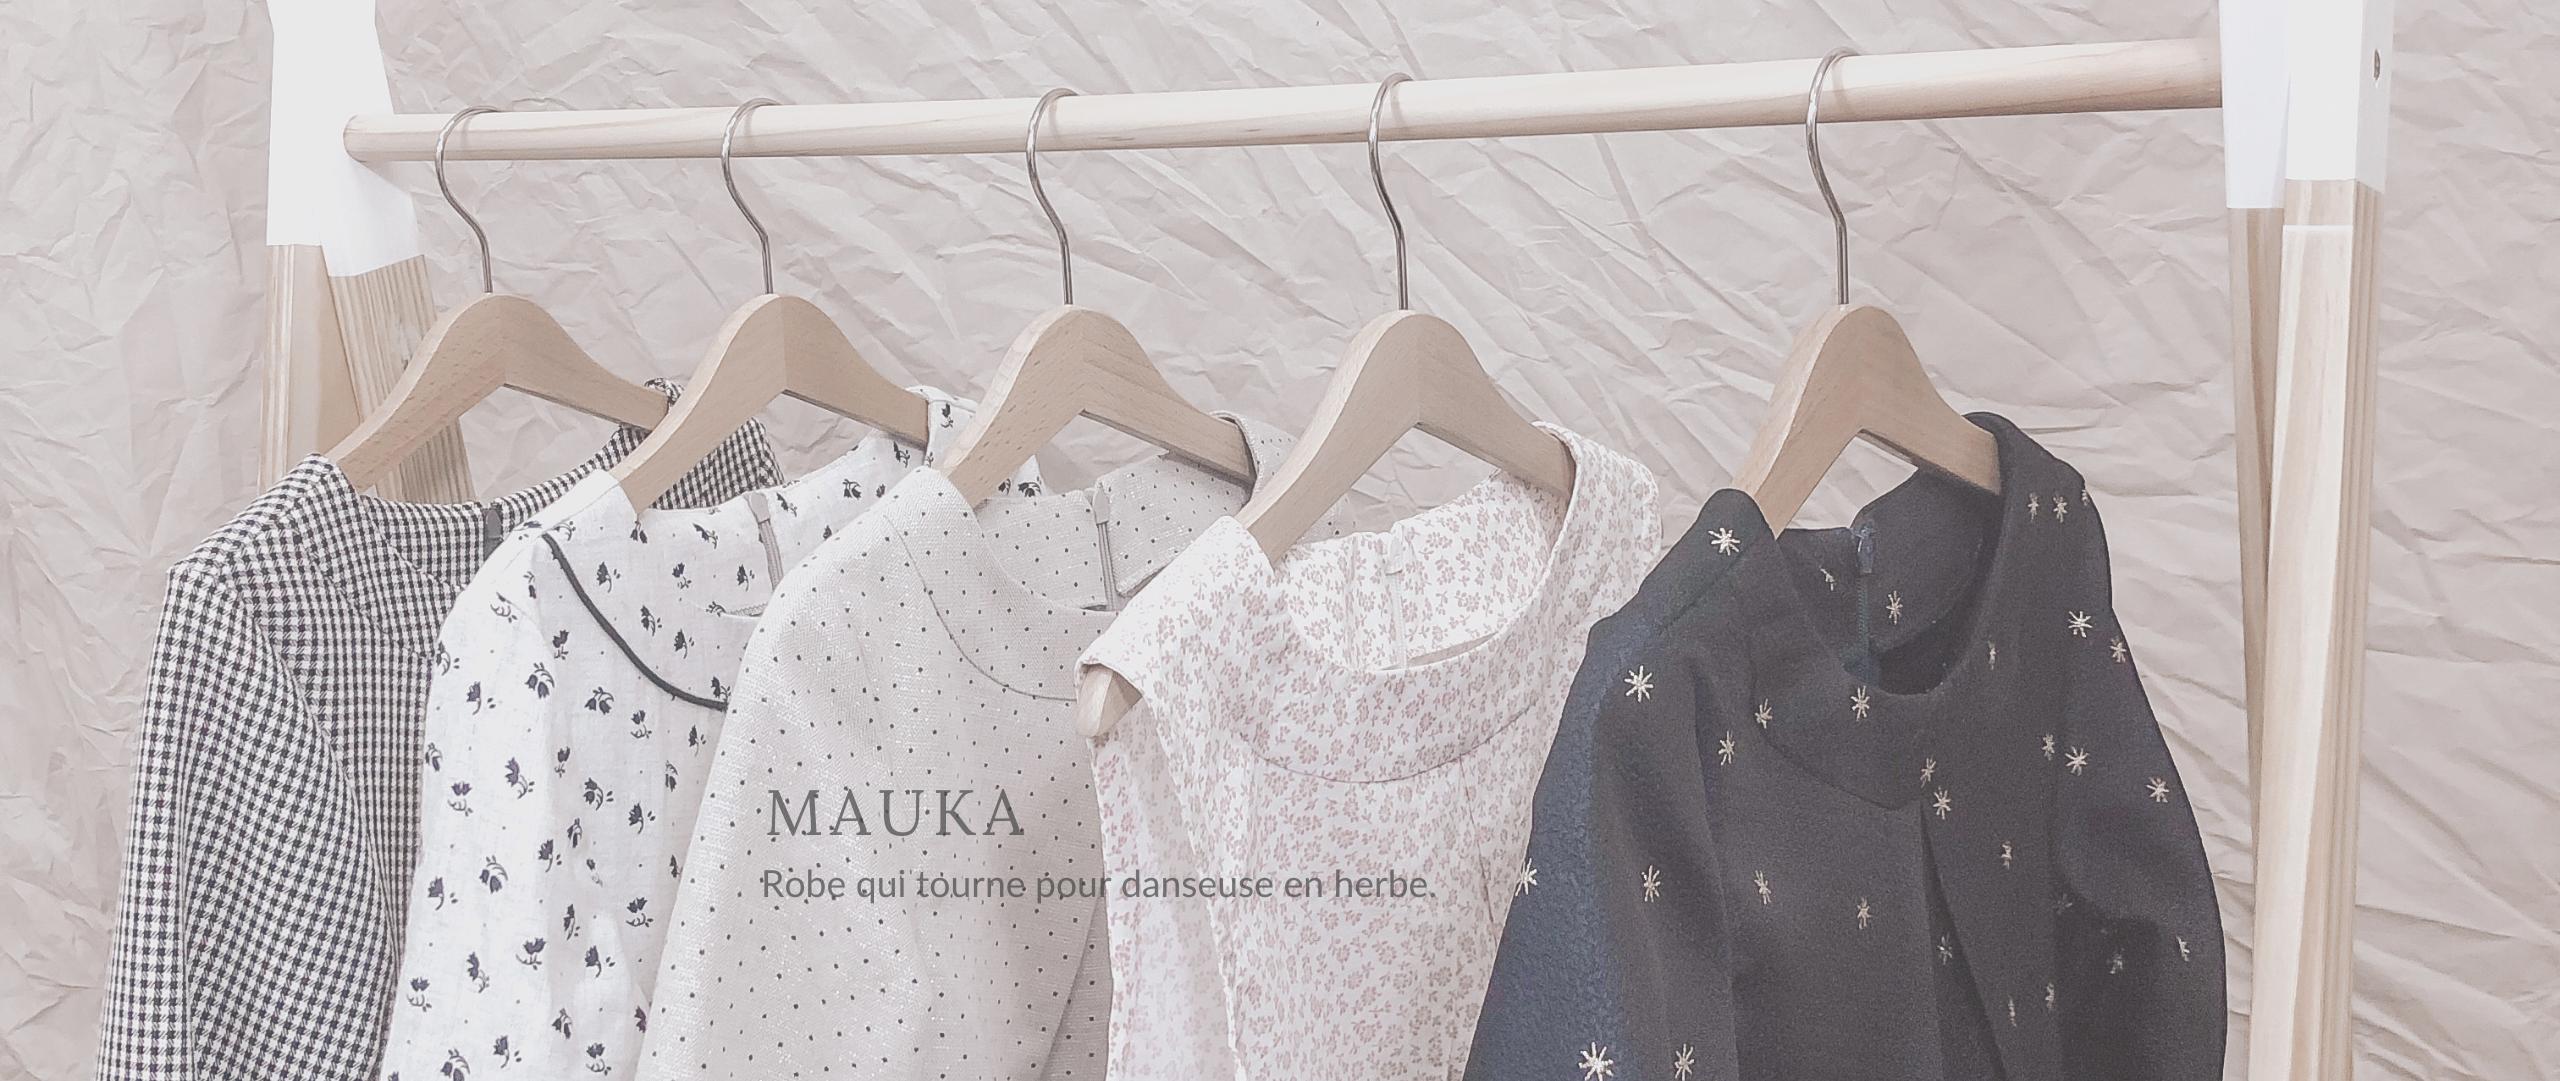 Robes Mauka sur penderie